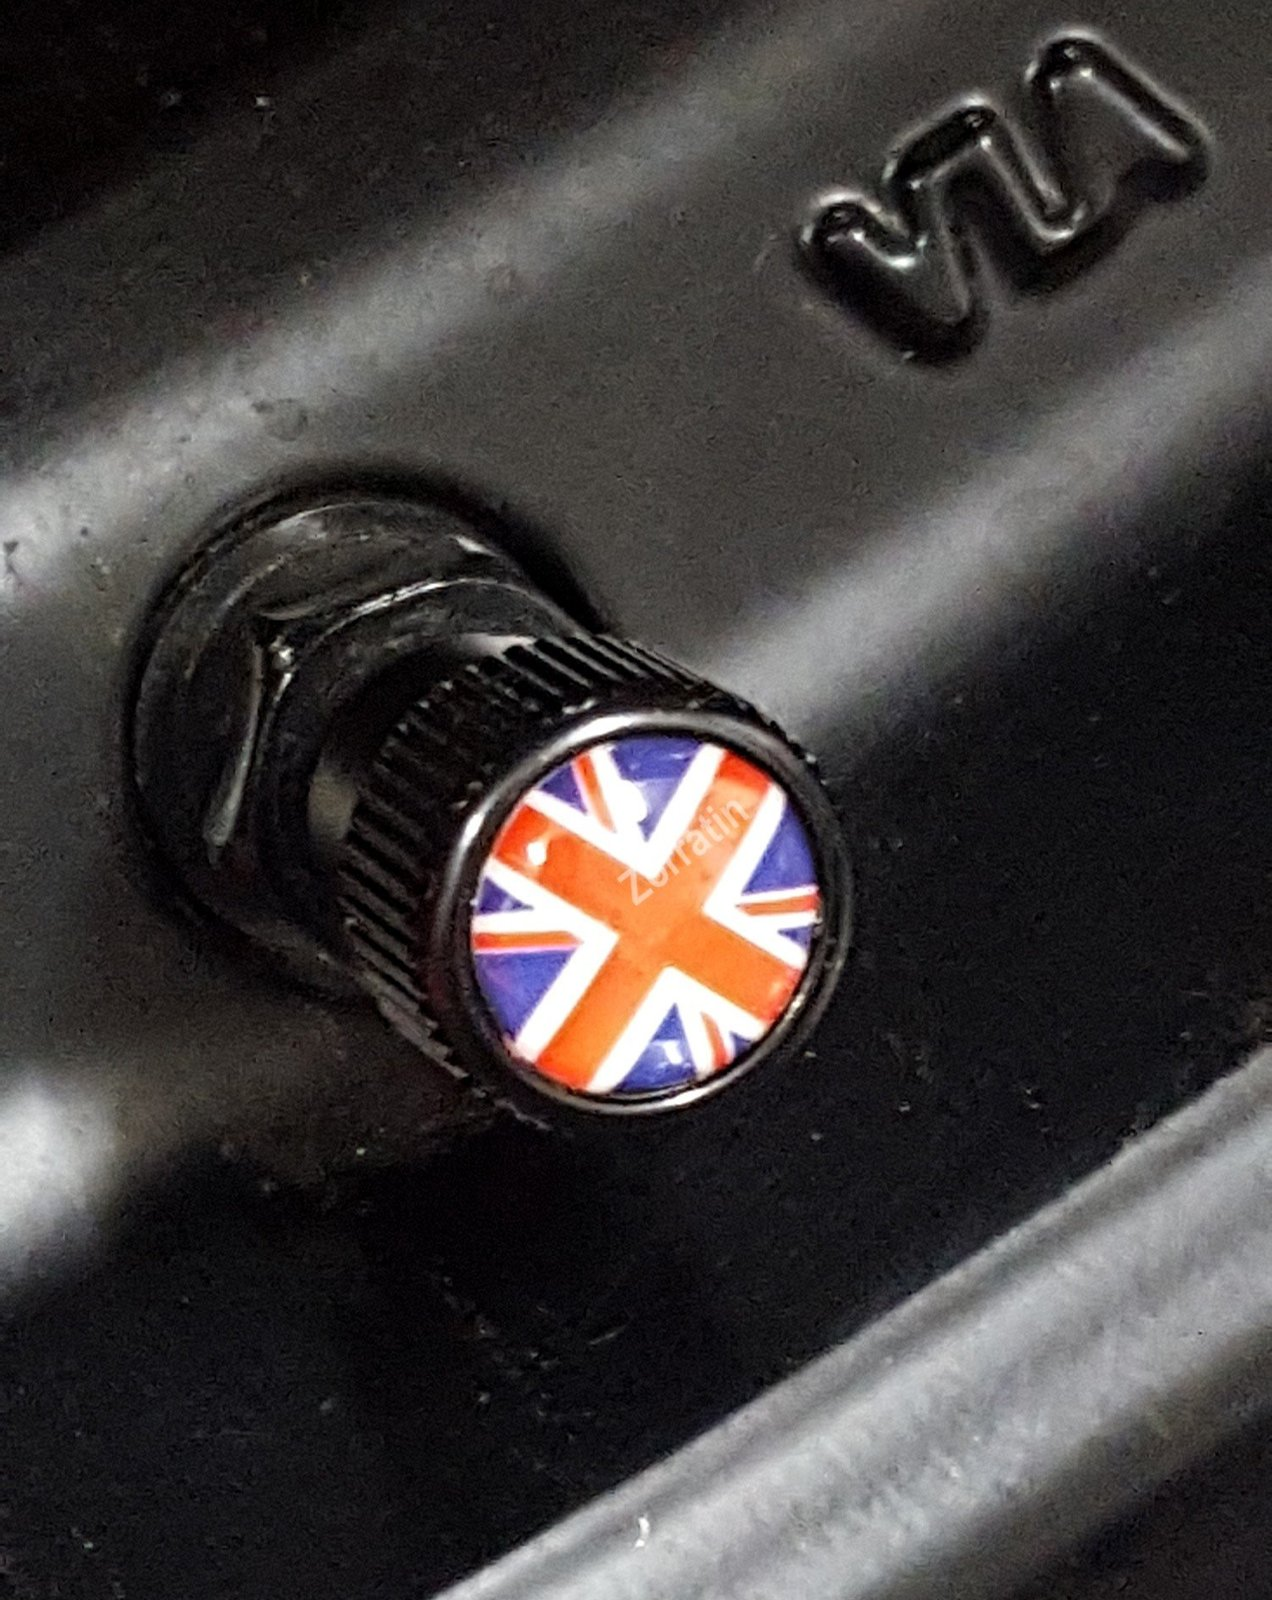 4x Zorratin Black Union Jack British Flag Tire Valve Stem Cap Cover for BMW Mini for sale  USA